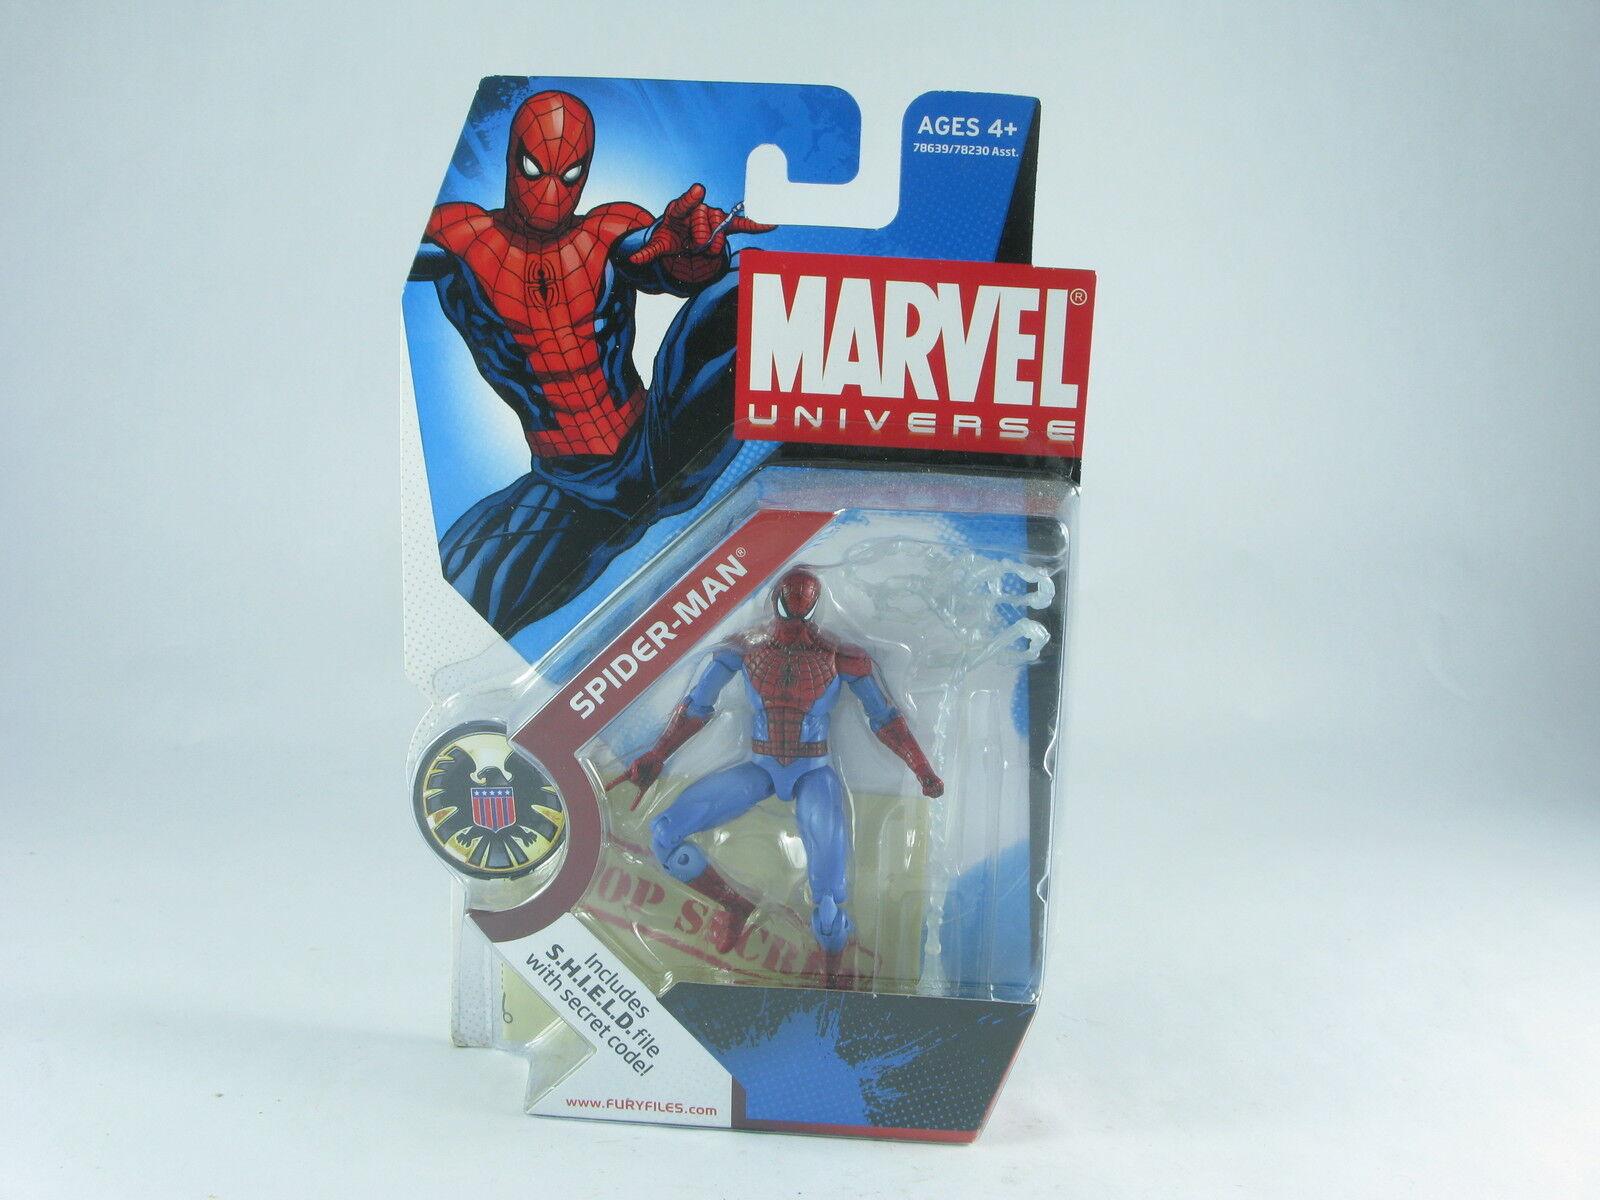 Marvel Universe Spider-man, 002 Light bluee 4  Figure MOSC New Unopened